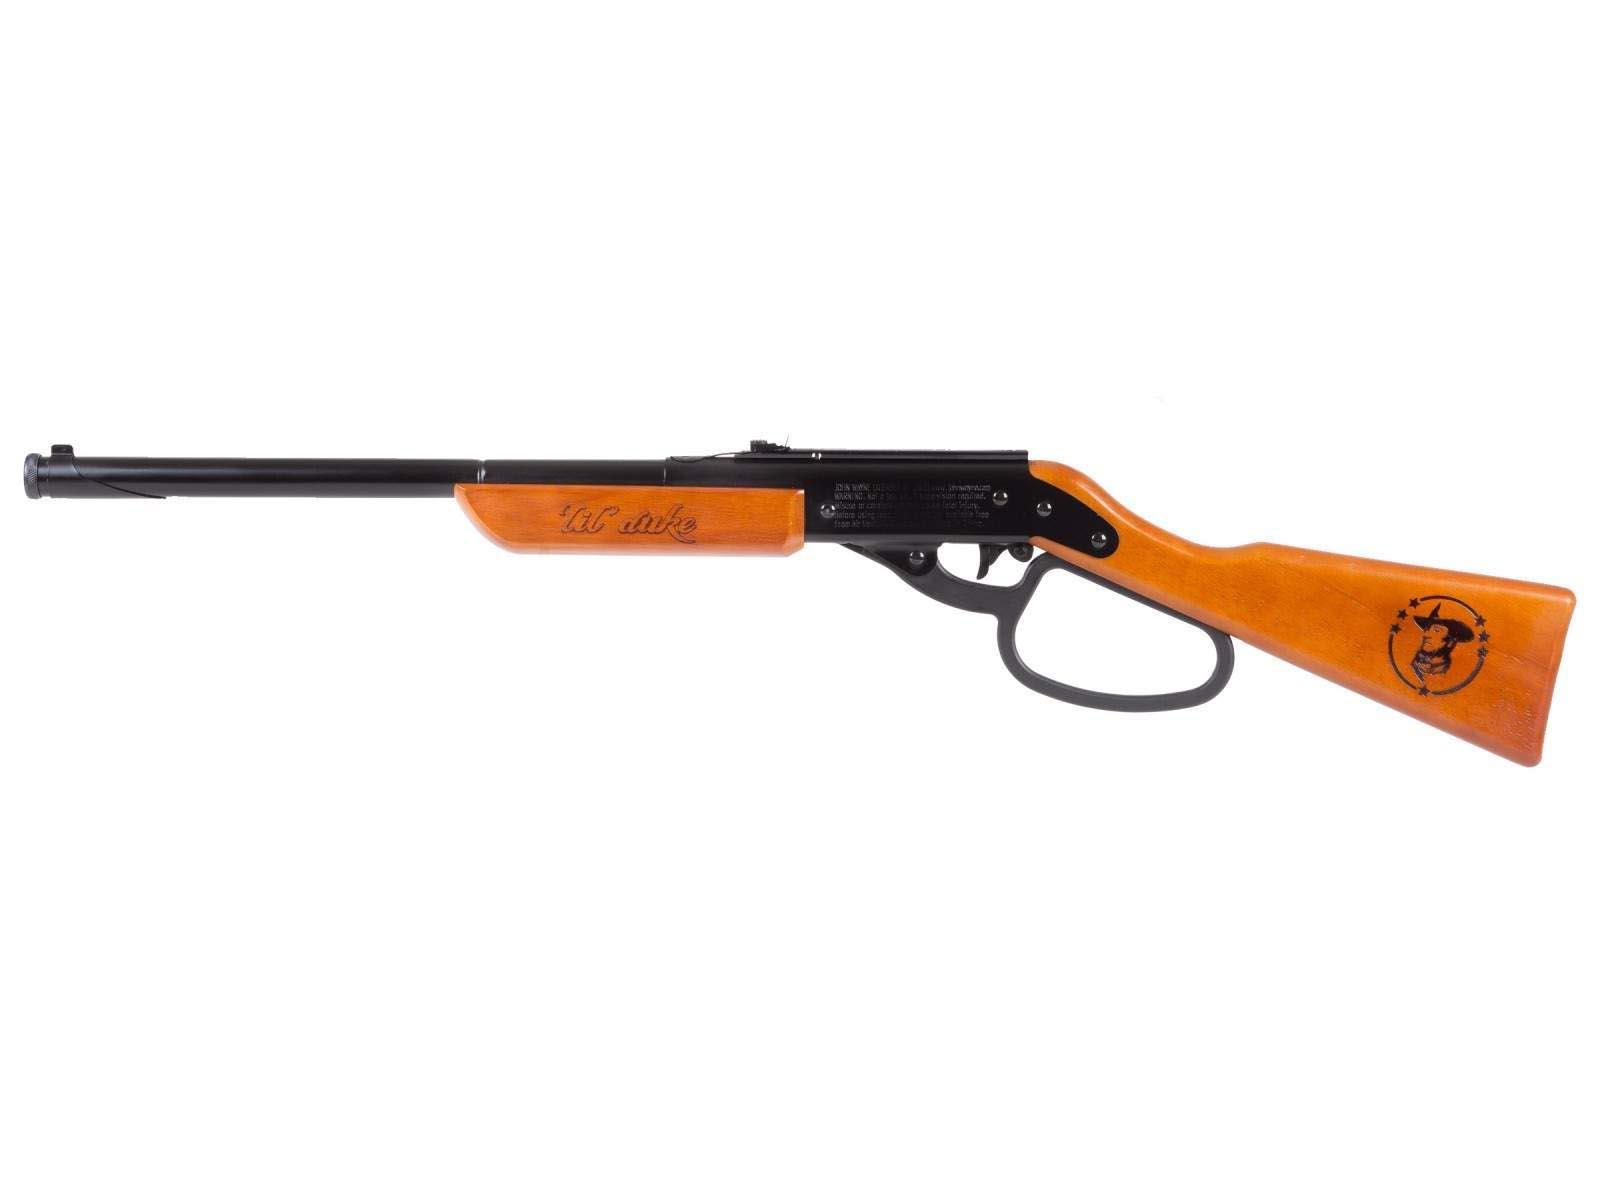 John Wayne Lil Duke BB Rifle, Plastic Handle